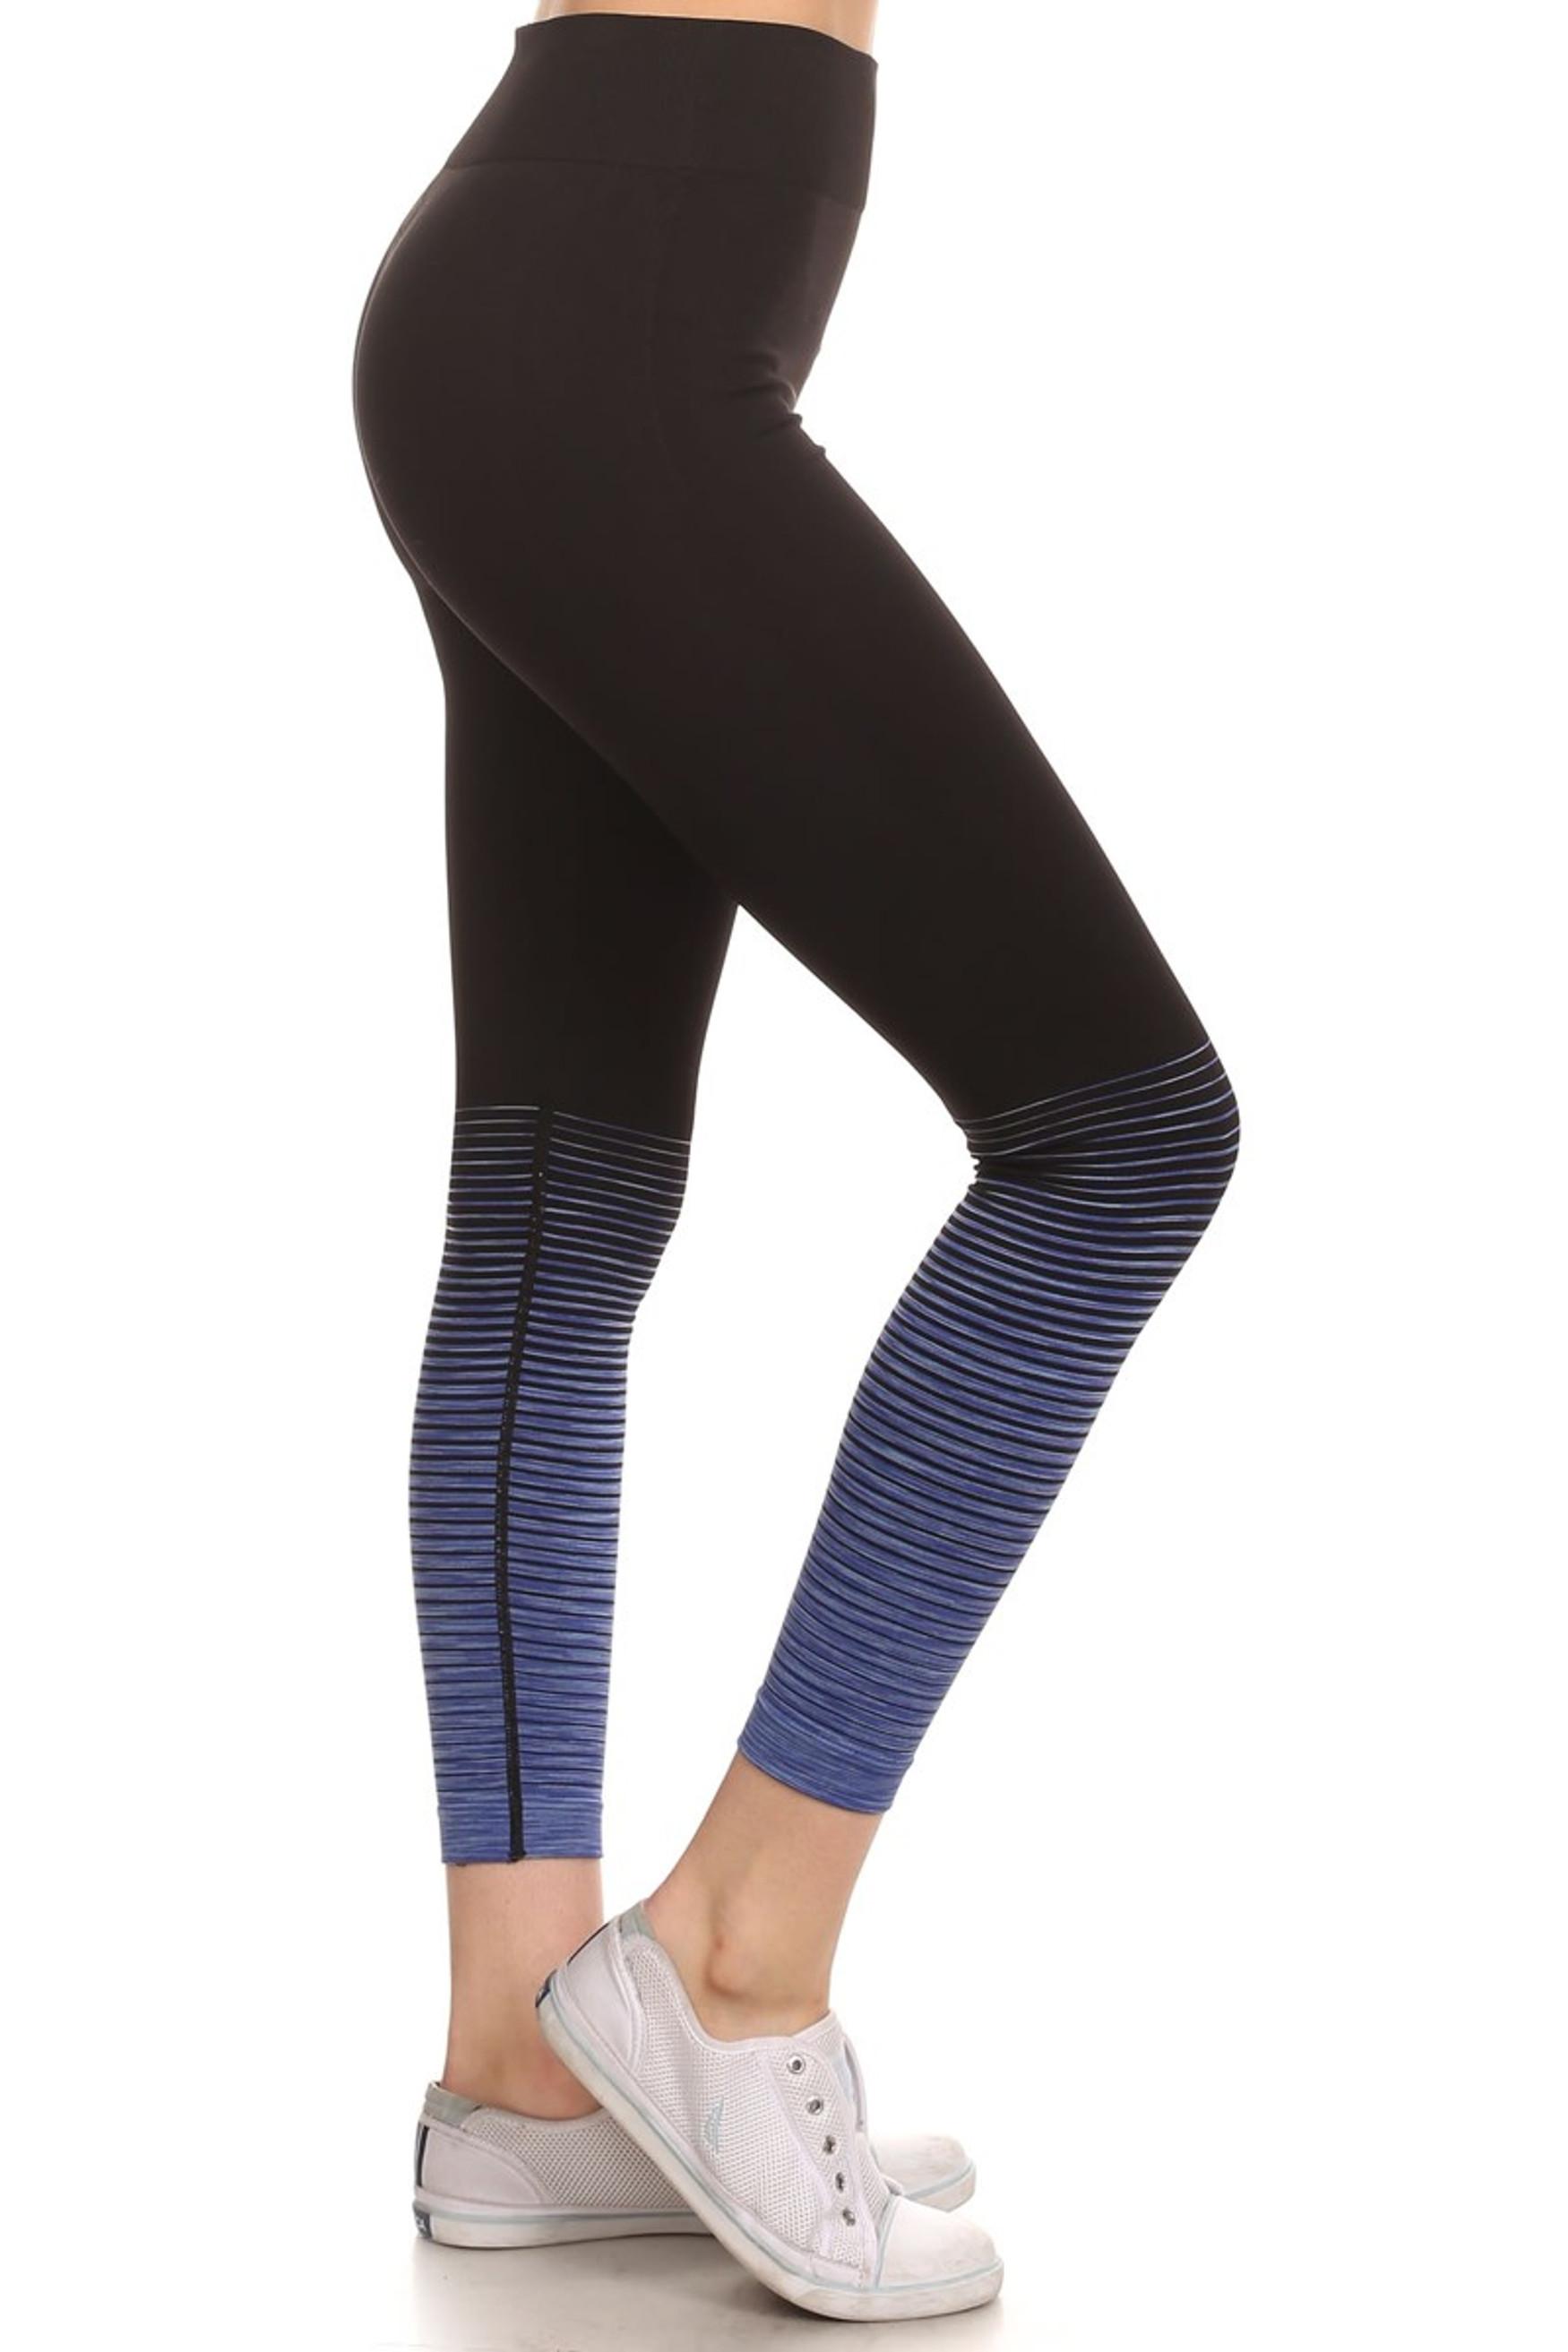 Blue Tornado Color Fade Workout Leggings